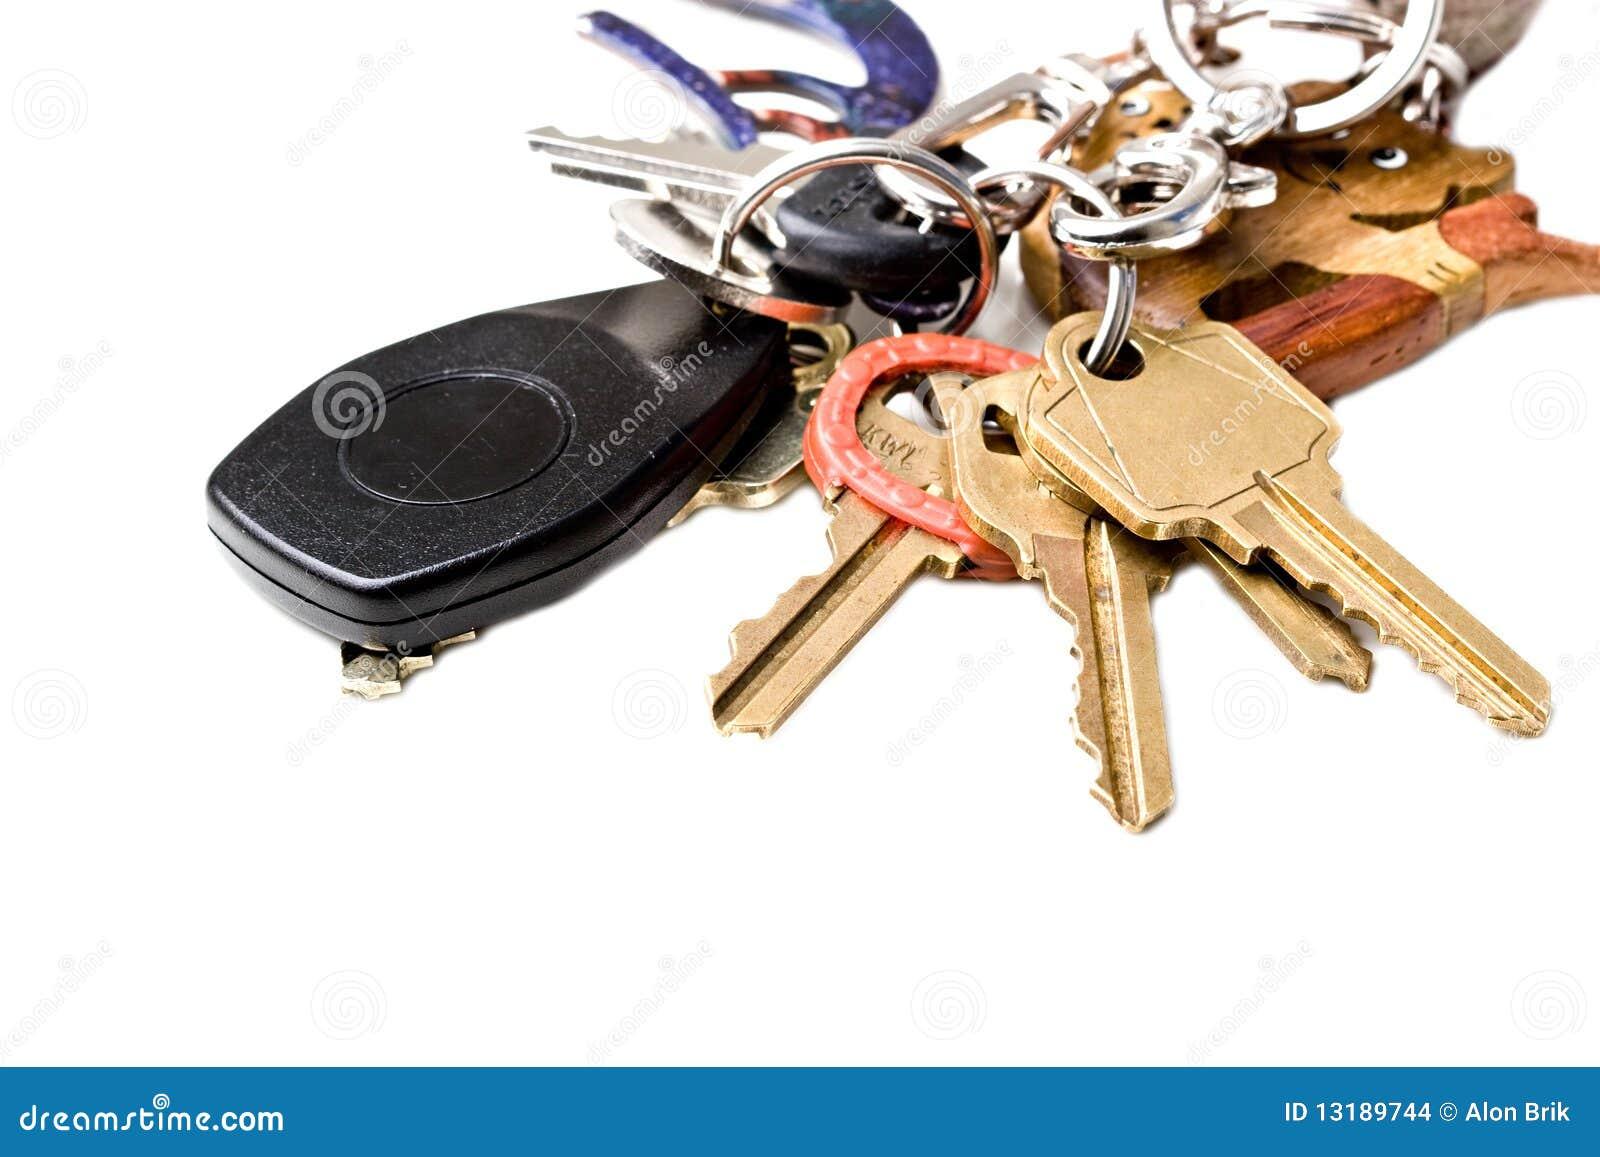 how to set macro keys